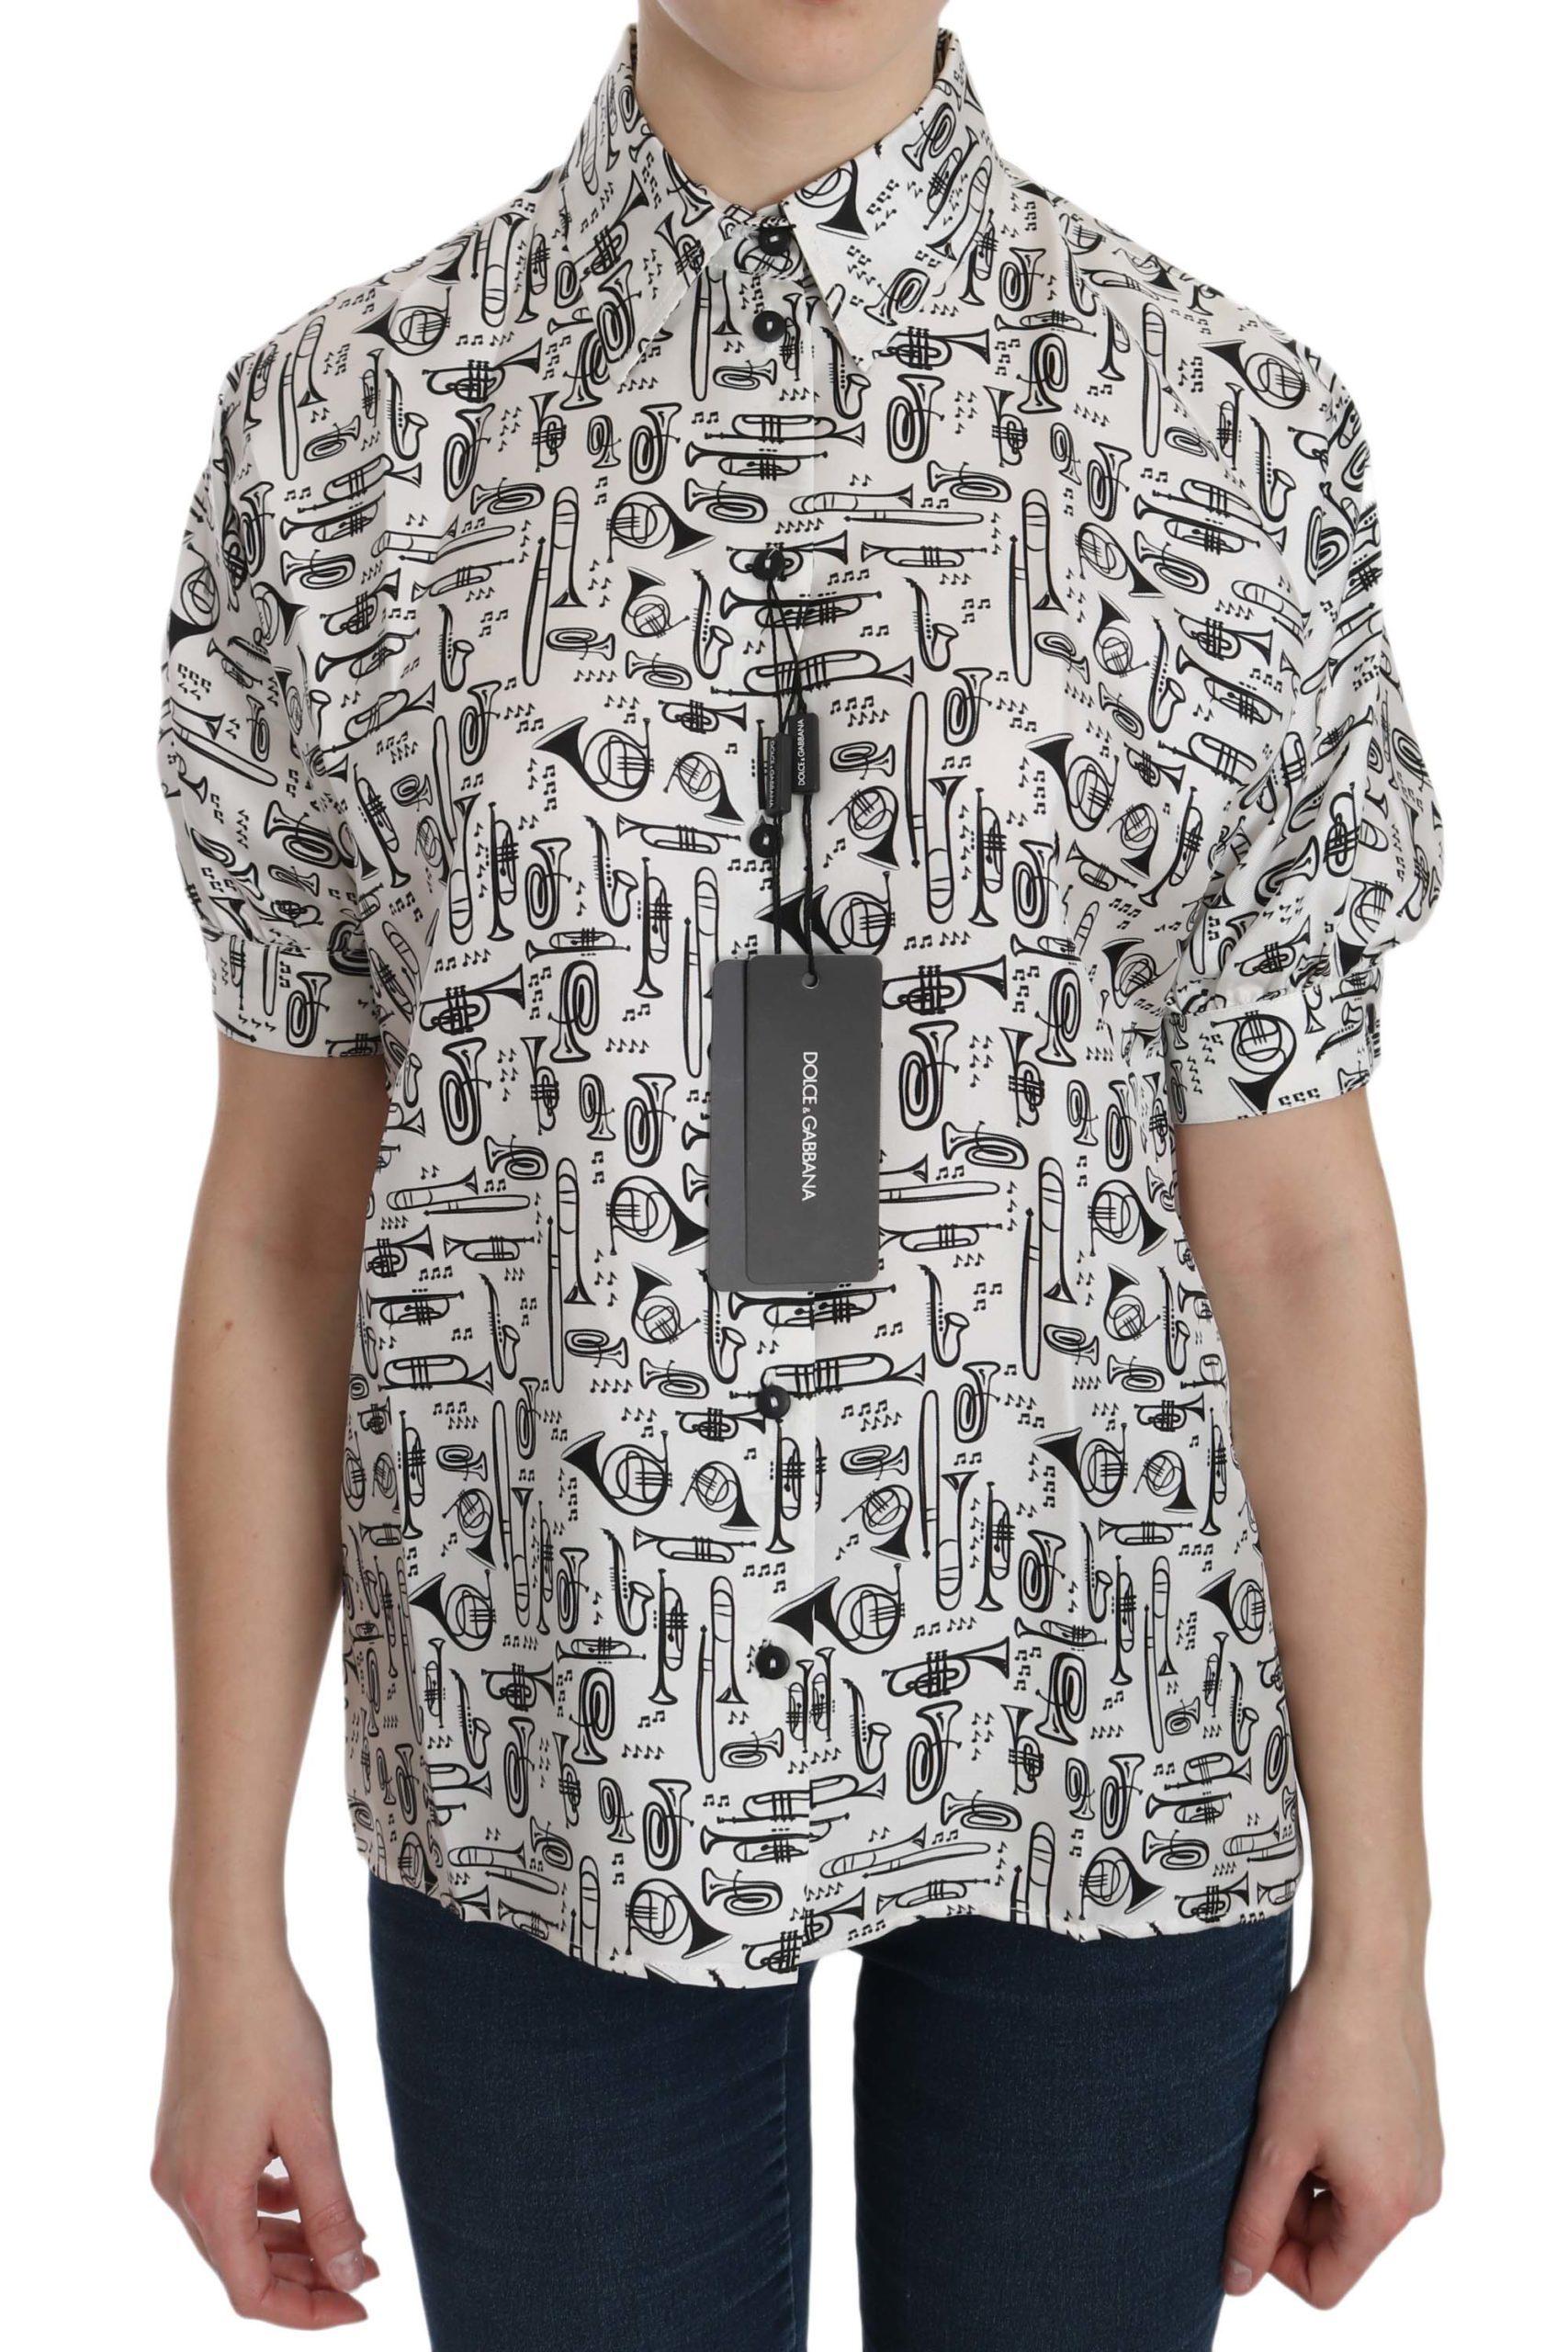 Dolce & Gabbana Women's Musical Instrument Collared Shirt White TSH3114 - IT36|XXS